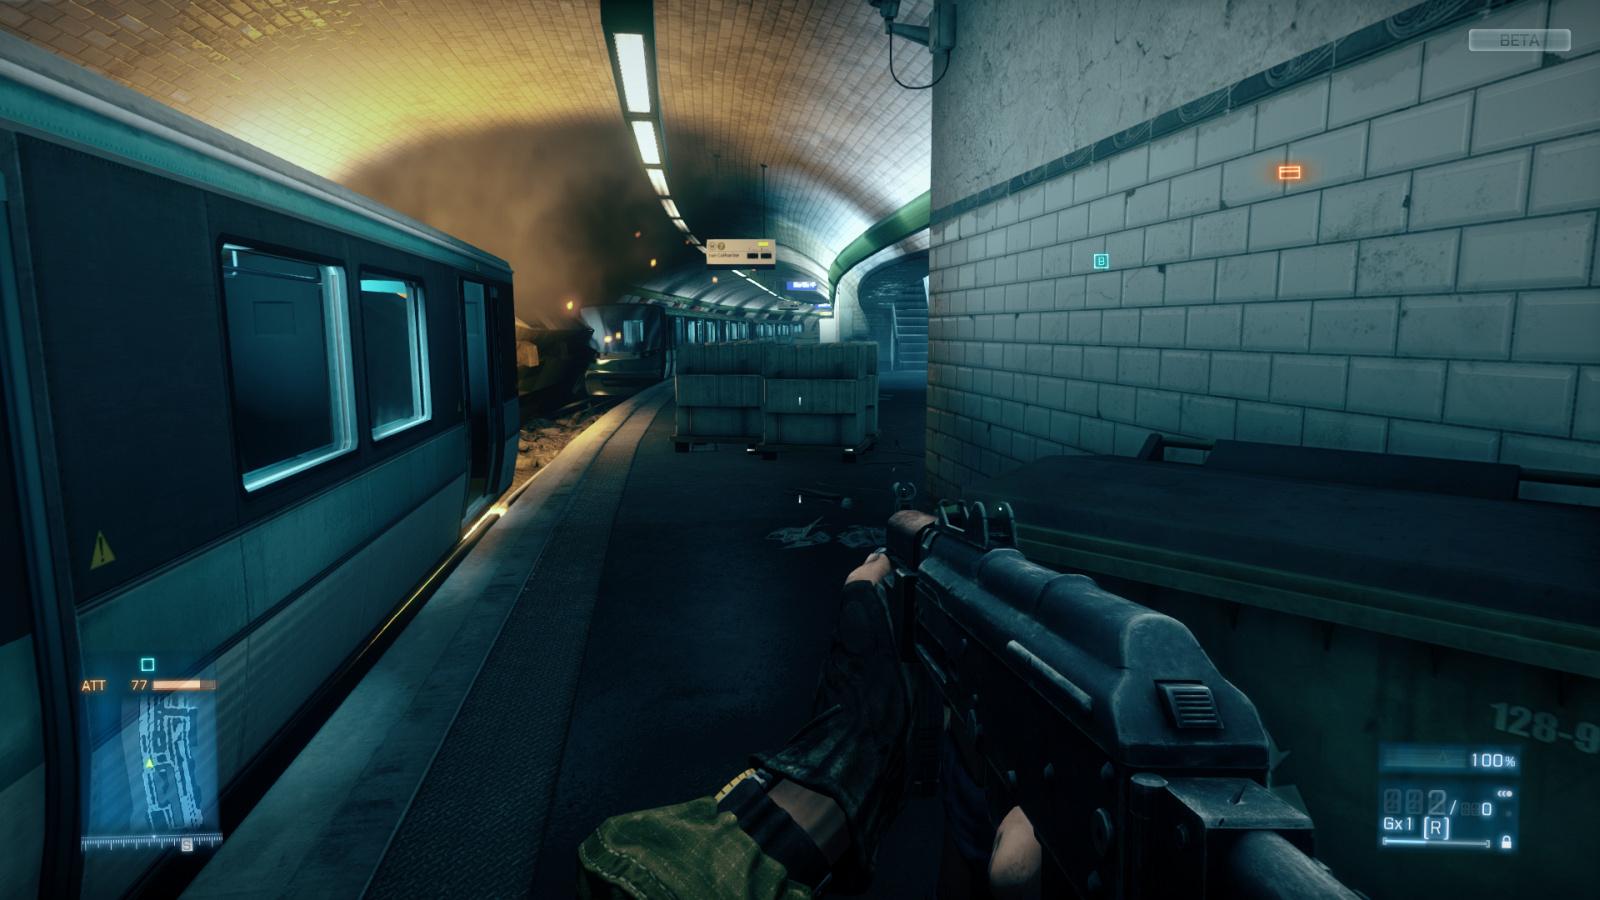 Beta Battlefieldu 3 je live – hratelnost, grafika, galerie 52421